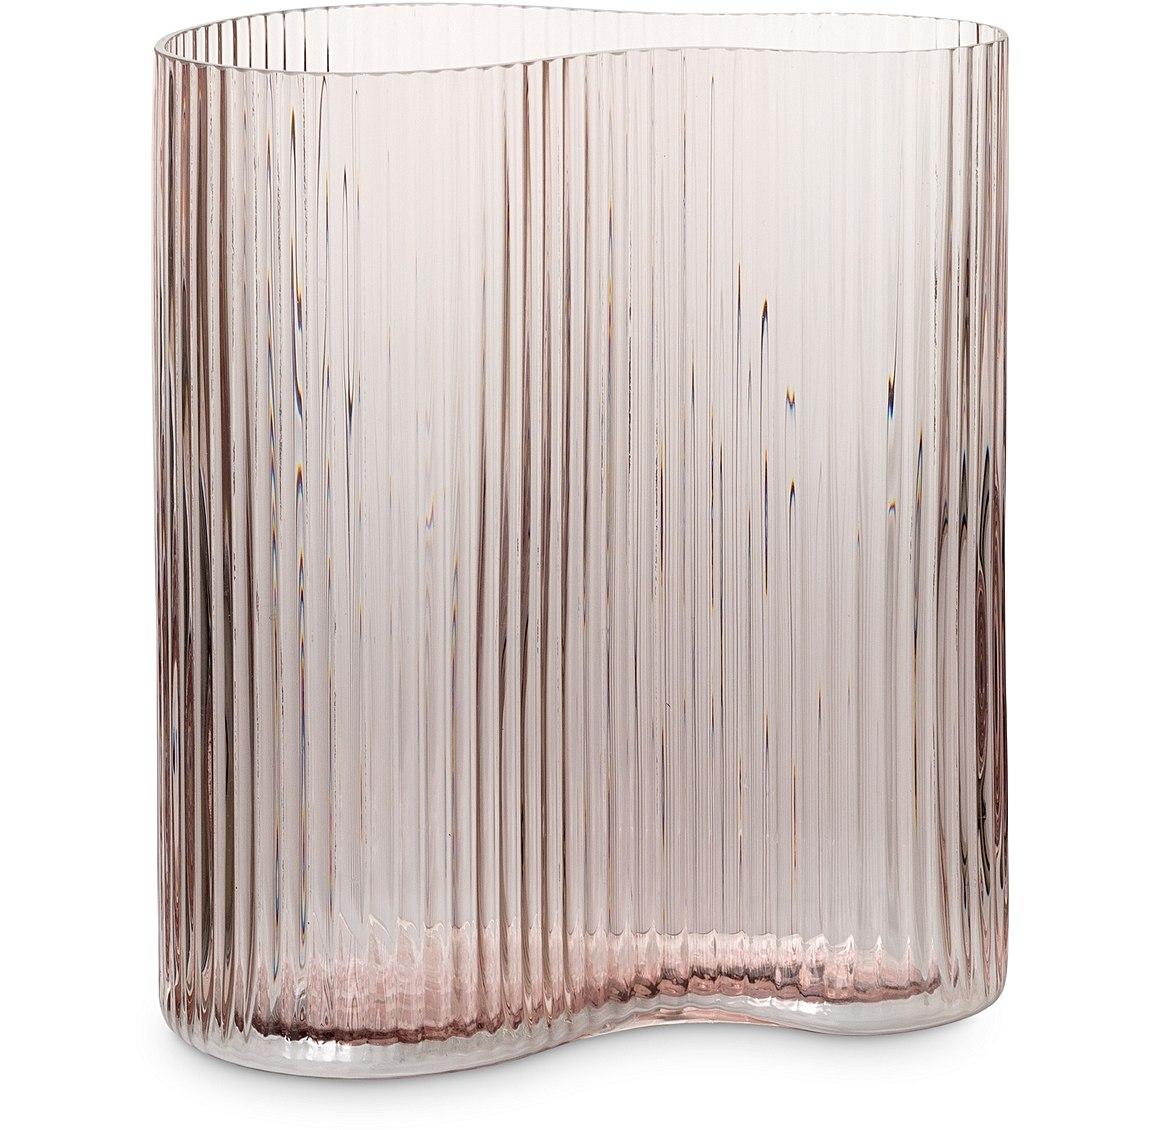 StudioGabrielle_Oliver Bonas - Petitine Short Pink Glass Vase